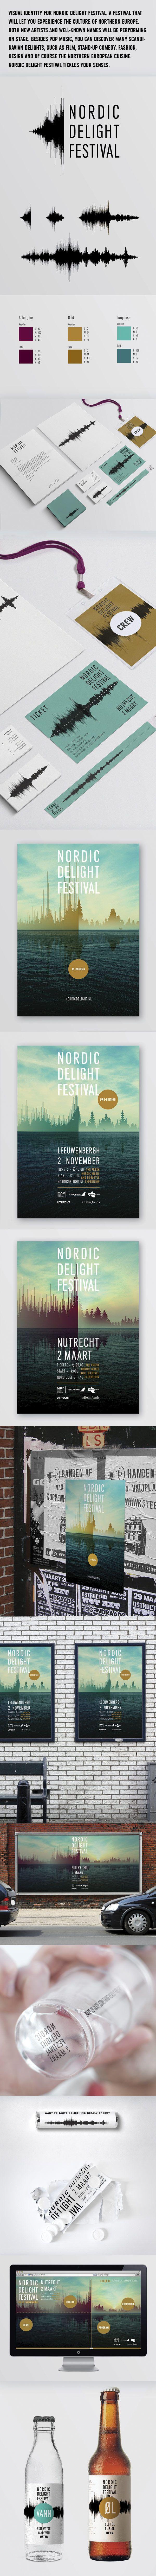 Nordic Delight Festival identity by CLEVER°FRANKE - Data visualization , via Behance